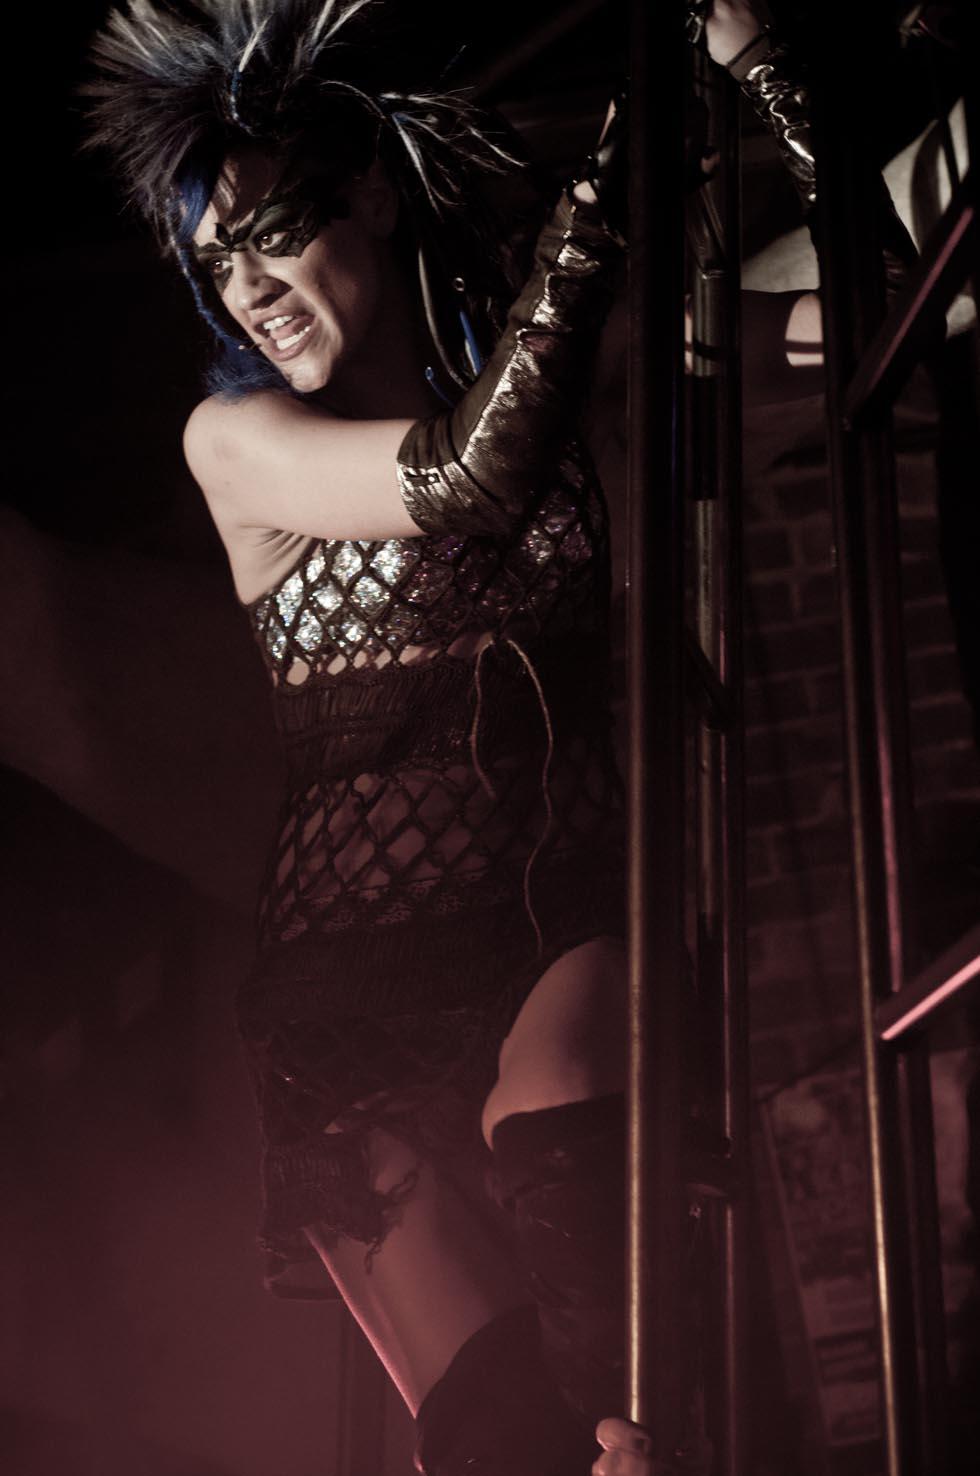 zum-schneider-nyc-2012-karneval-apocalyptika-5136.jpg